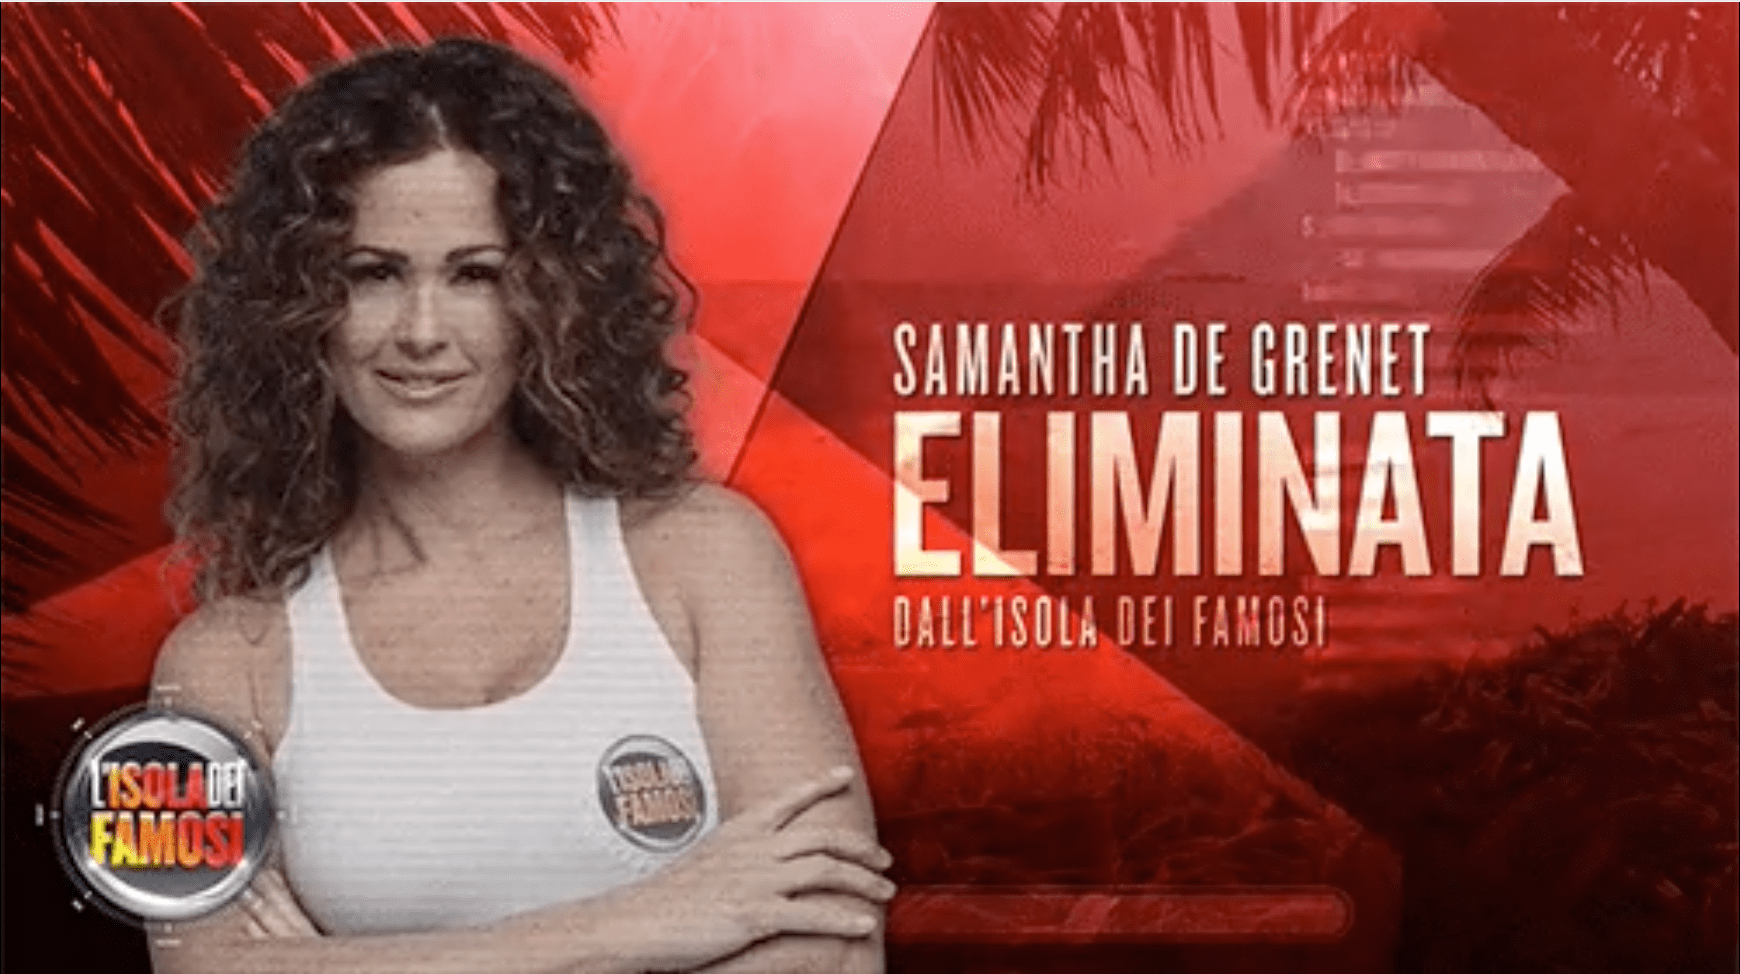 L'Isola dei Famosi 2017, eliminata Samantha de Grenet: la 'regina' abbandona la Palapa